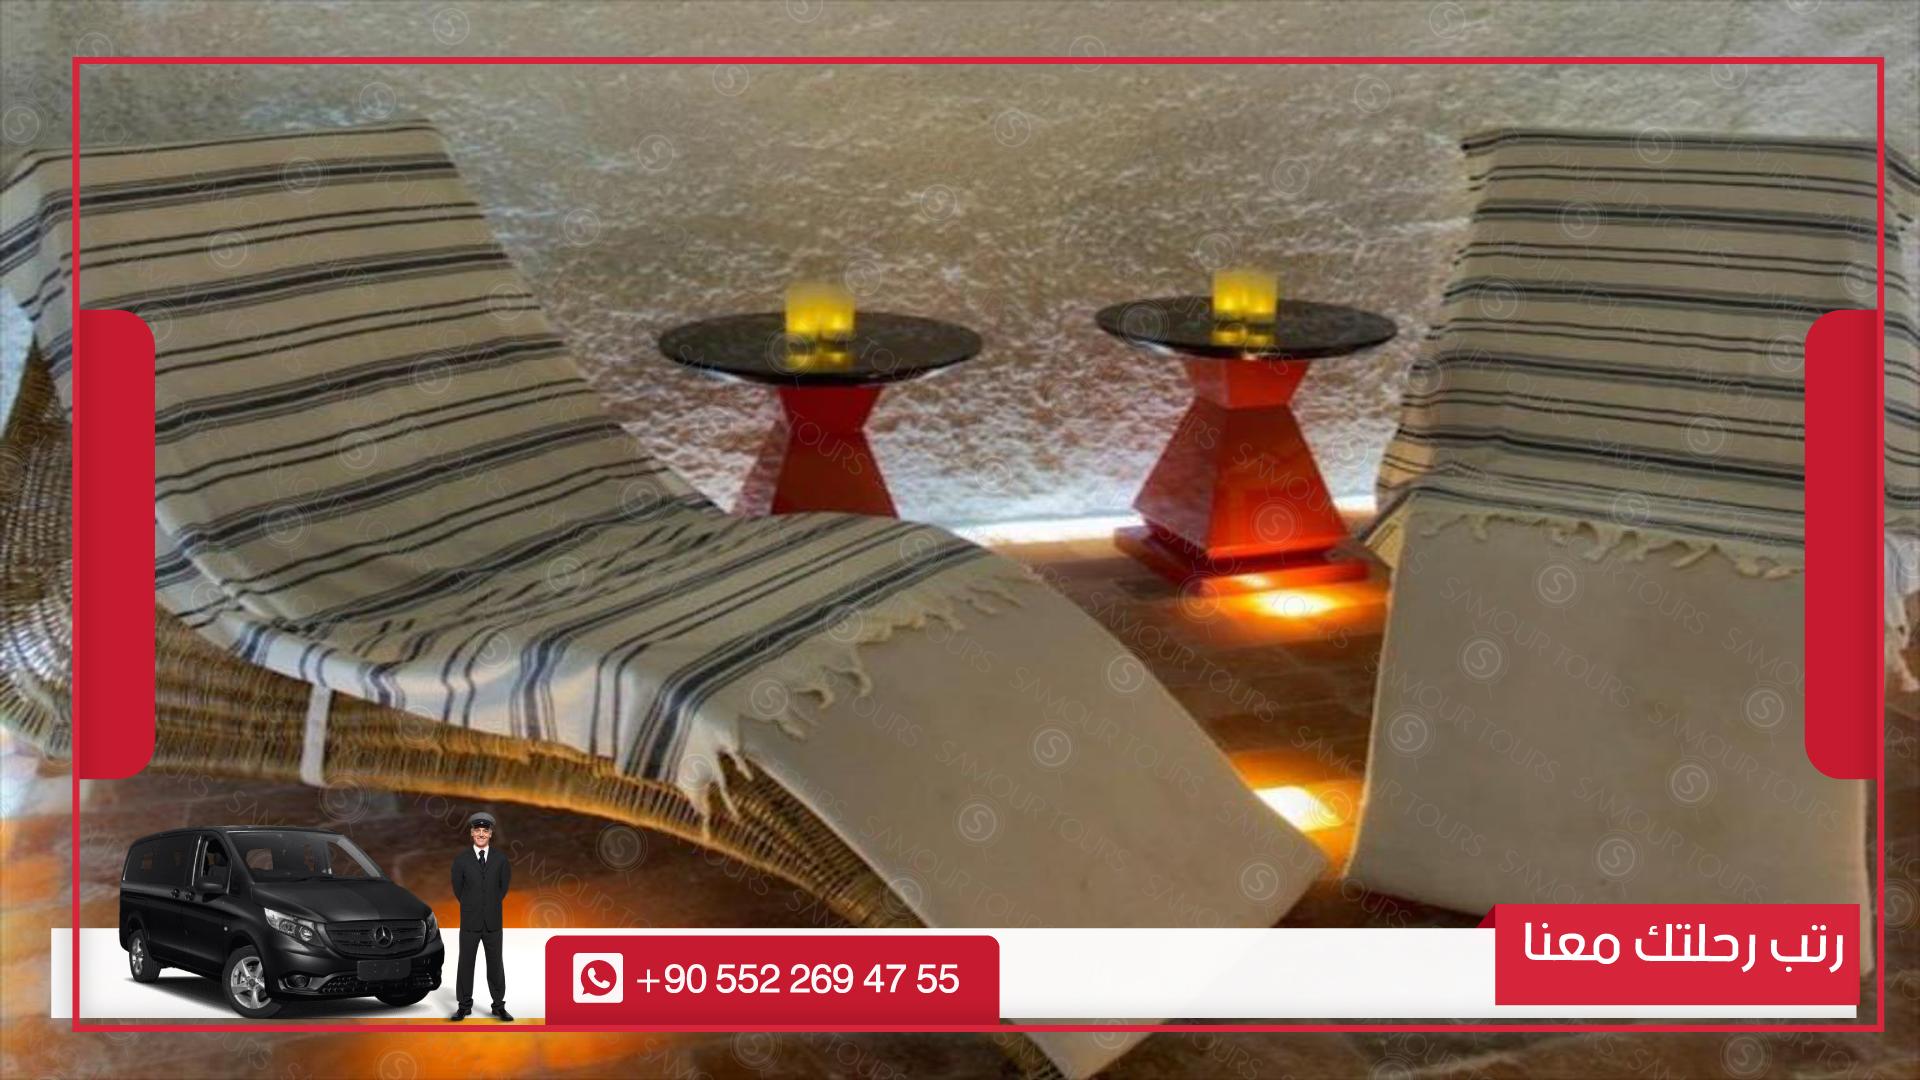 فندق سورا هاجيا صوفيا اسطنبول